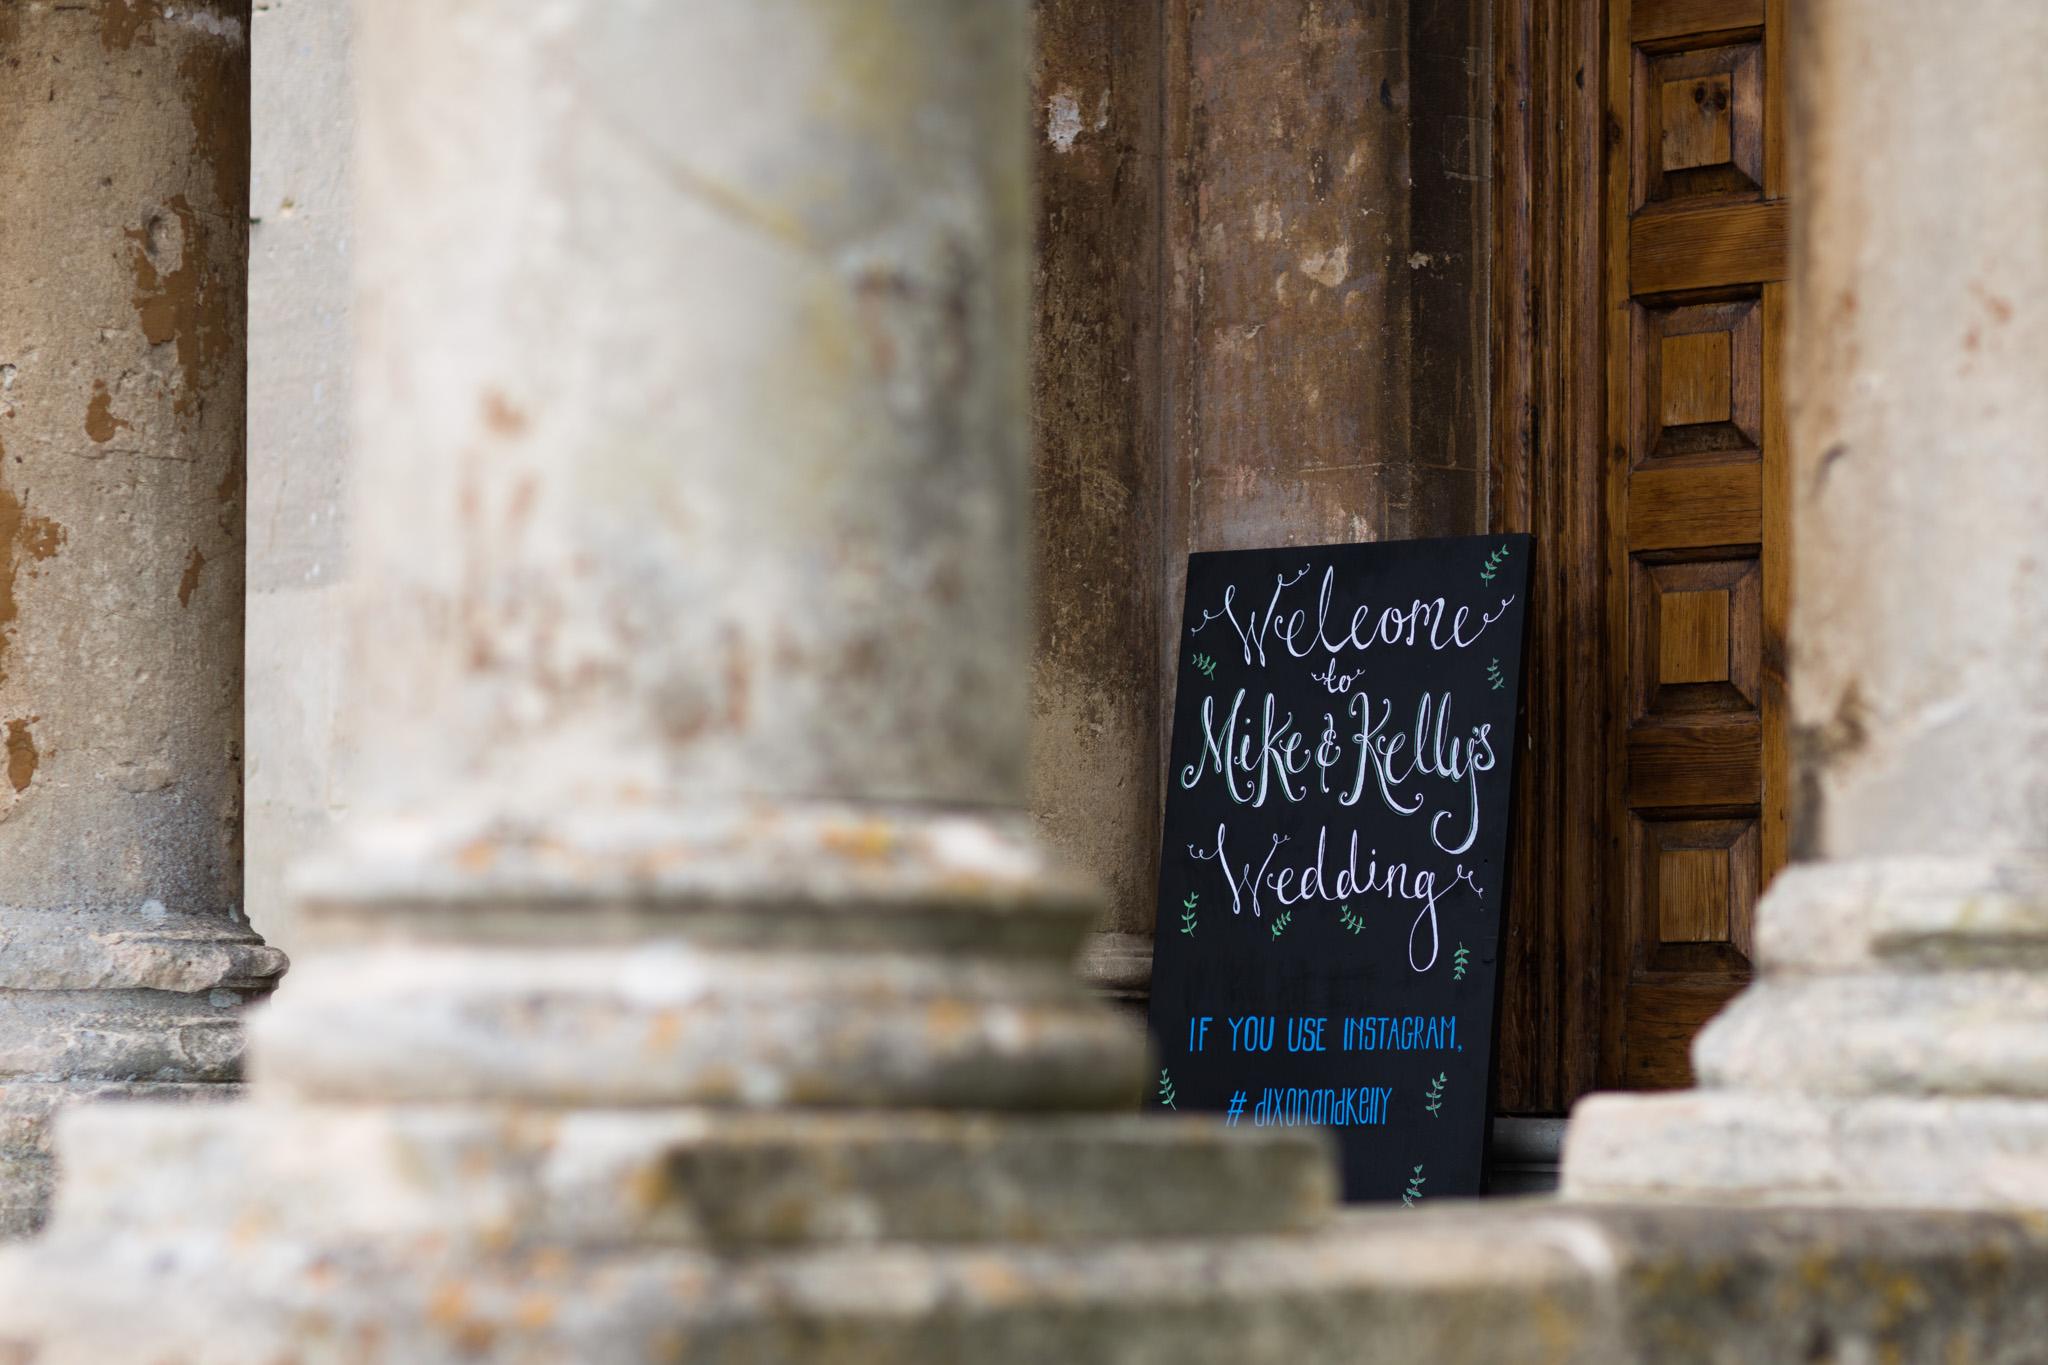 Mark_Barnes_Gloucester_Wedding_Photographer_Elmore_Court_Wedding_Photography_Mike+Kelly-15.jpg